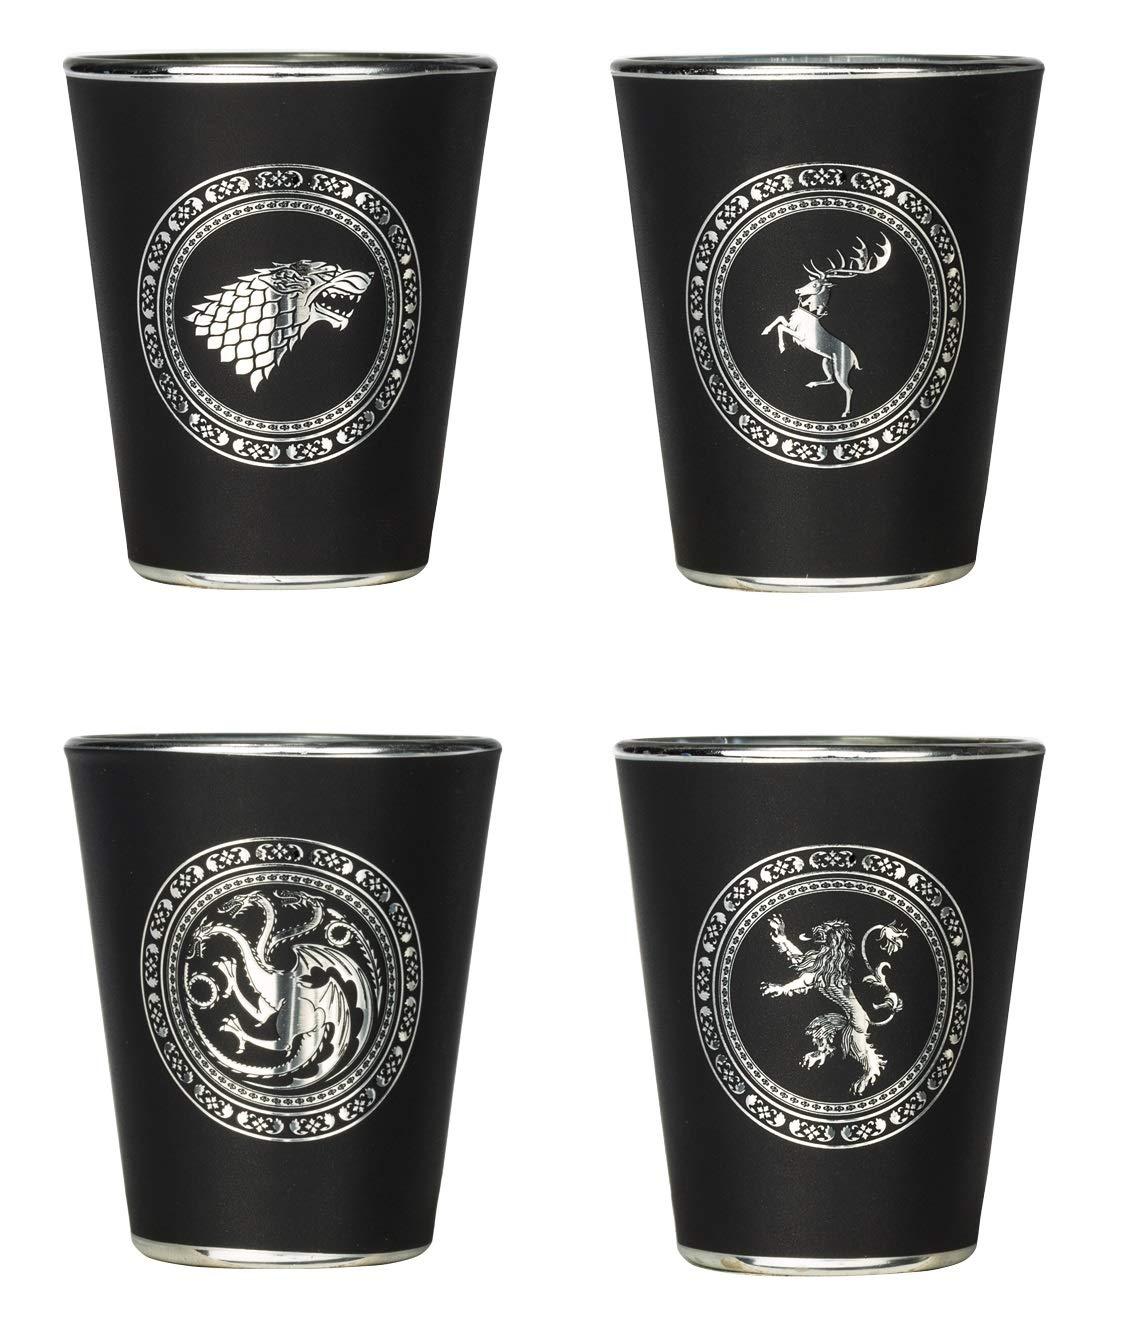 Rabbit Tanaka Game of Thrones House Sigil Shot Glass Set (Set of 4) by Rabbit Tanaka